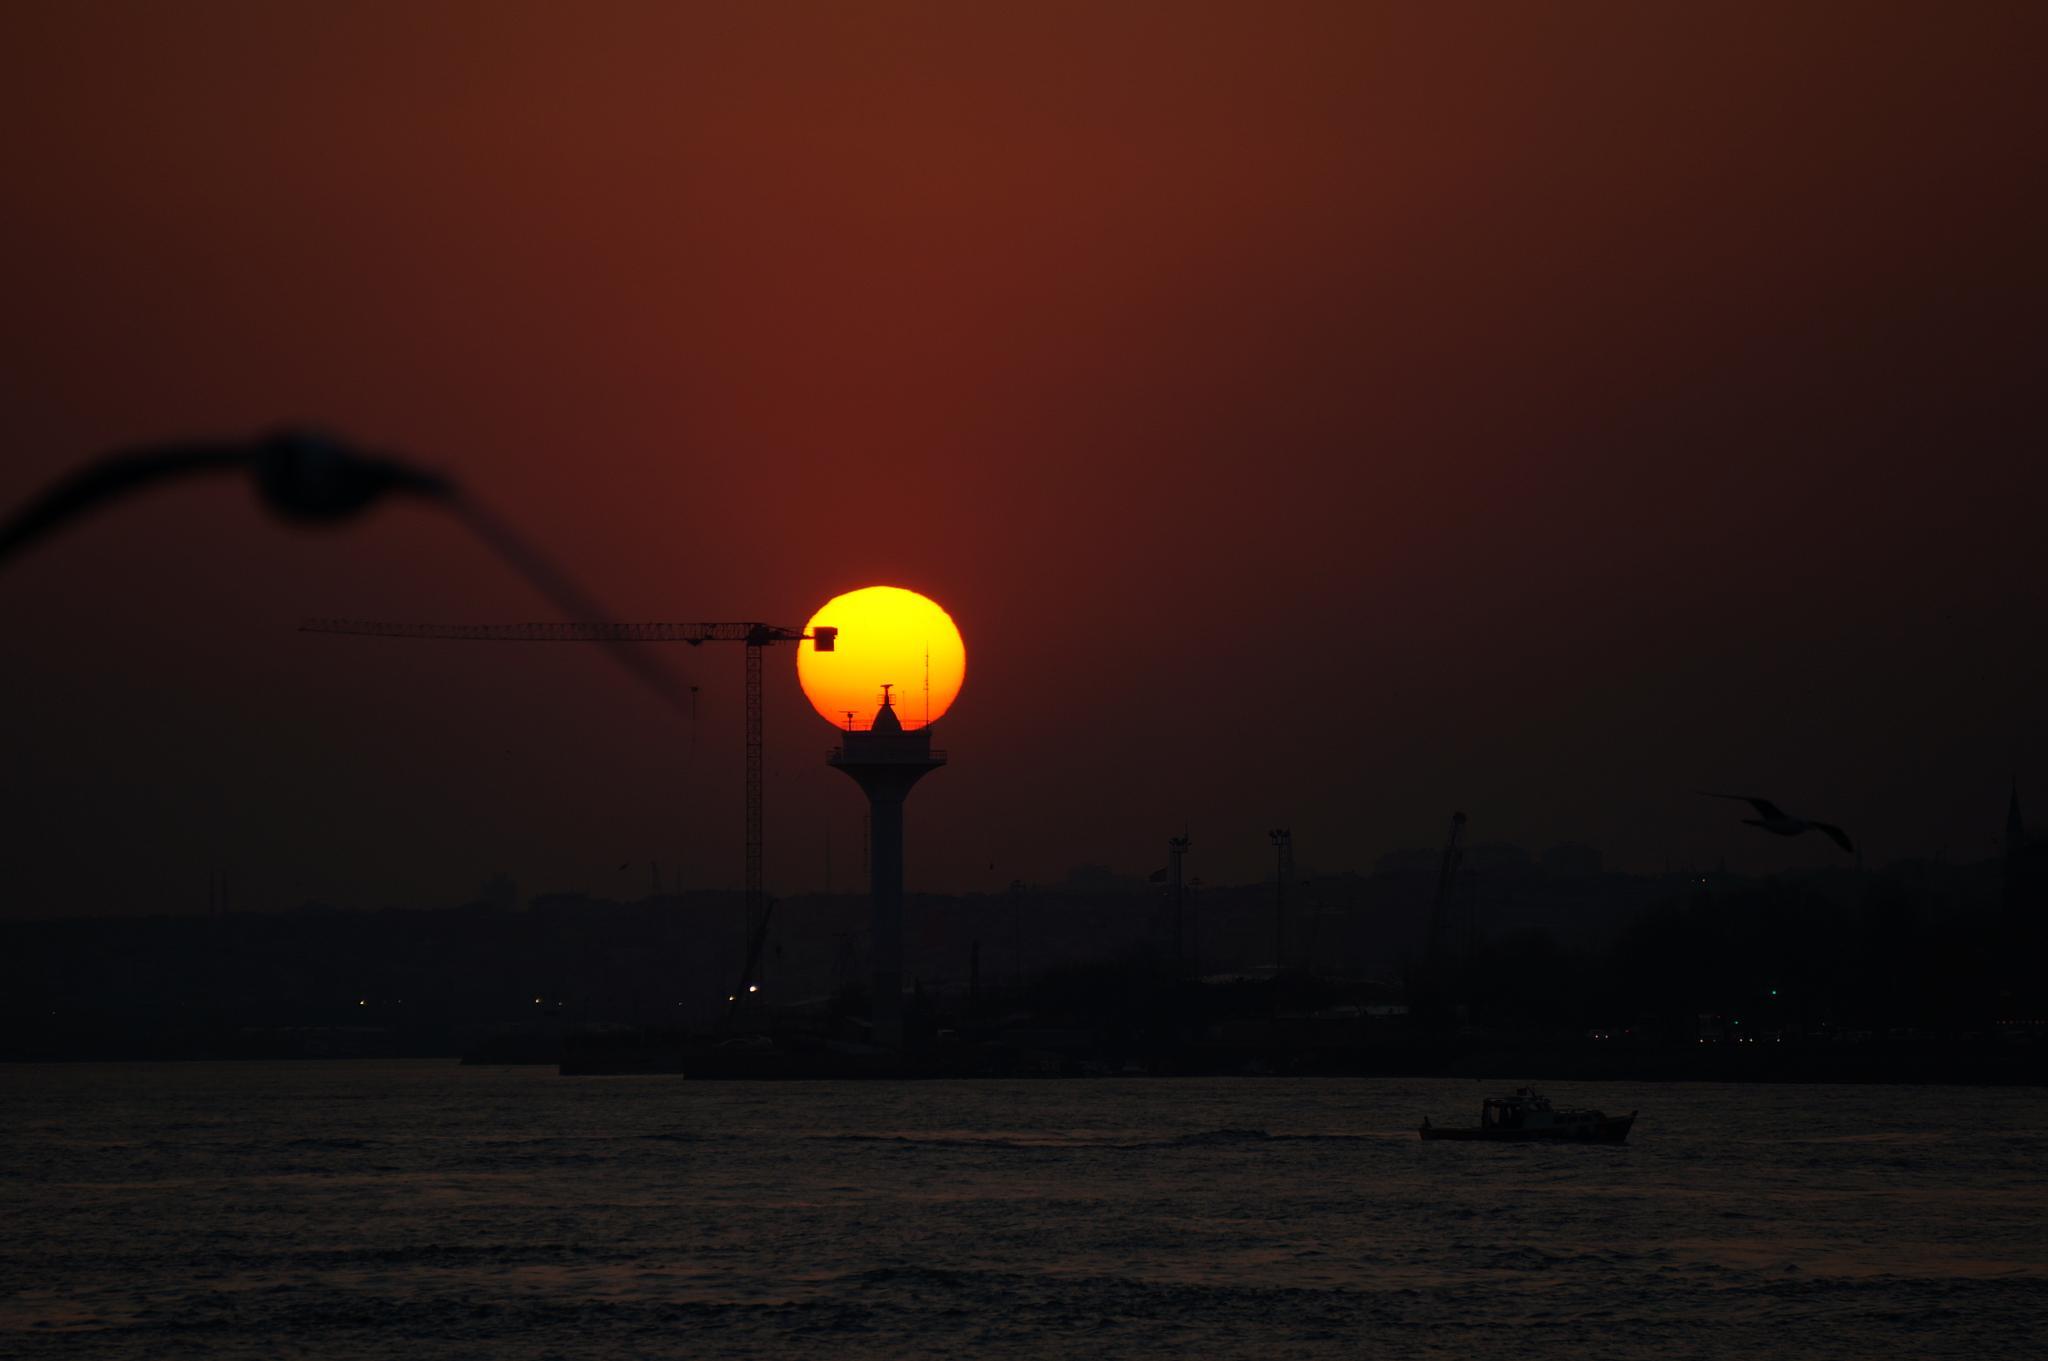 urban sun lamp by Yavuz Sevgi